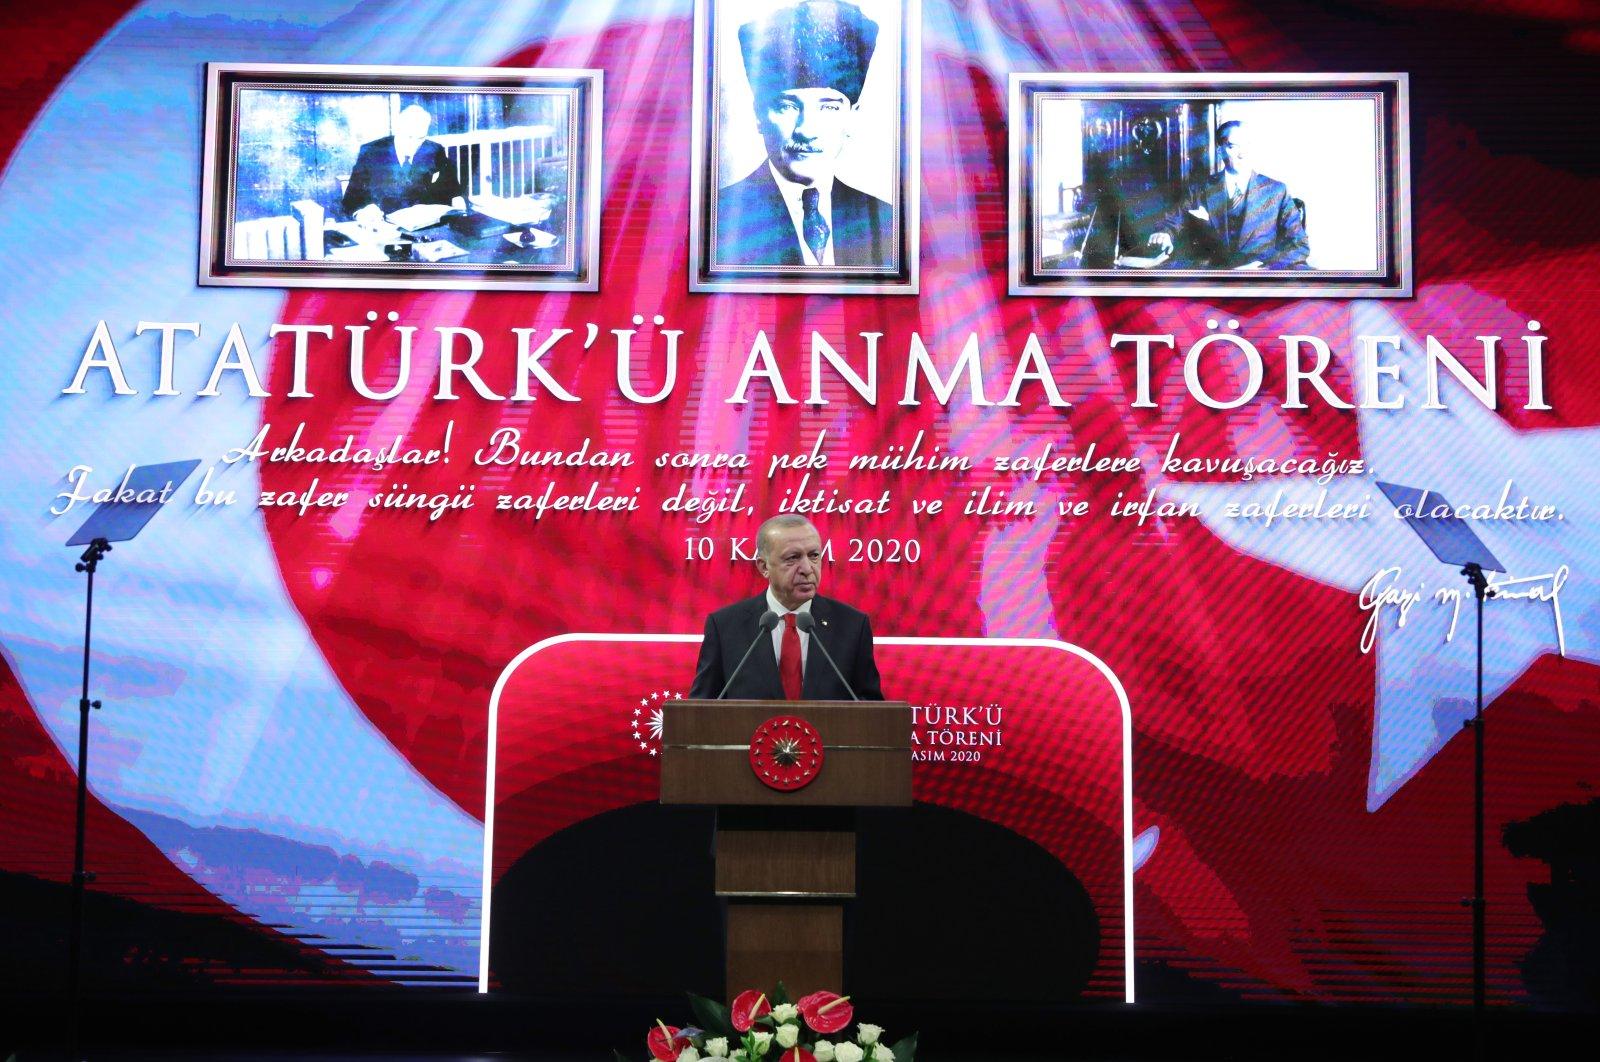 President Recep Tayyip Erdoğan speaks during a ceremony to commemorate the 82nd death anniversary of Mustafa Kemal Atatürk, the founder of the Republic of Turkey, in Ankara, Turkey, Nov. 10, 2020. (AA Photo)